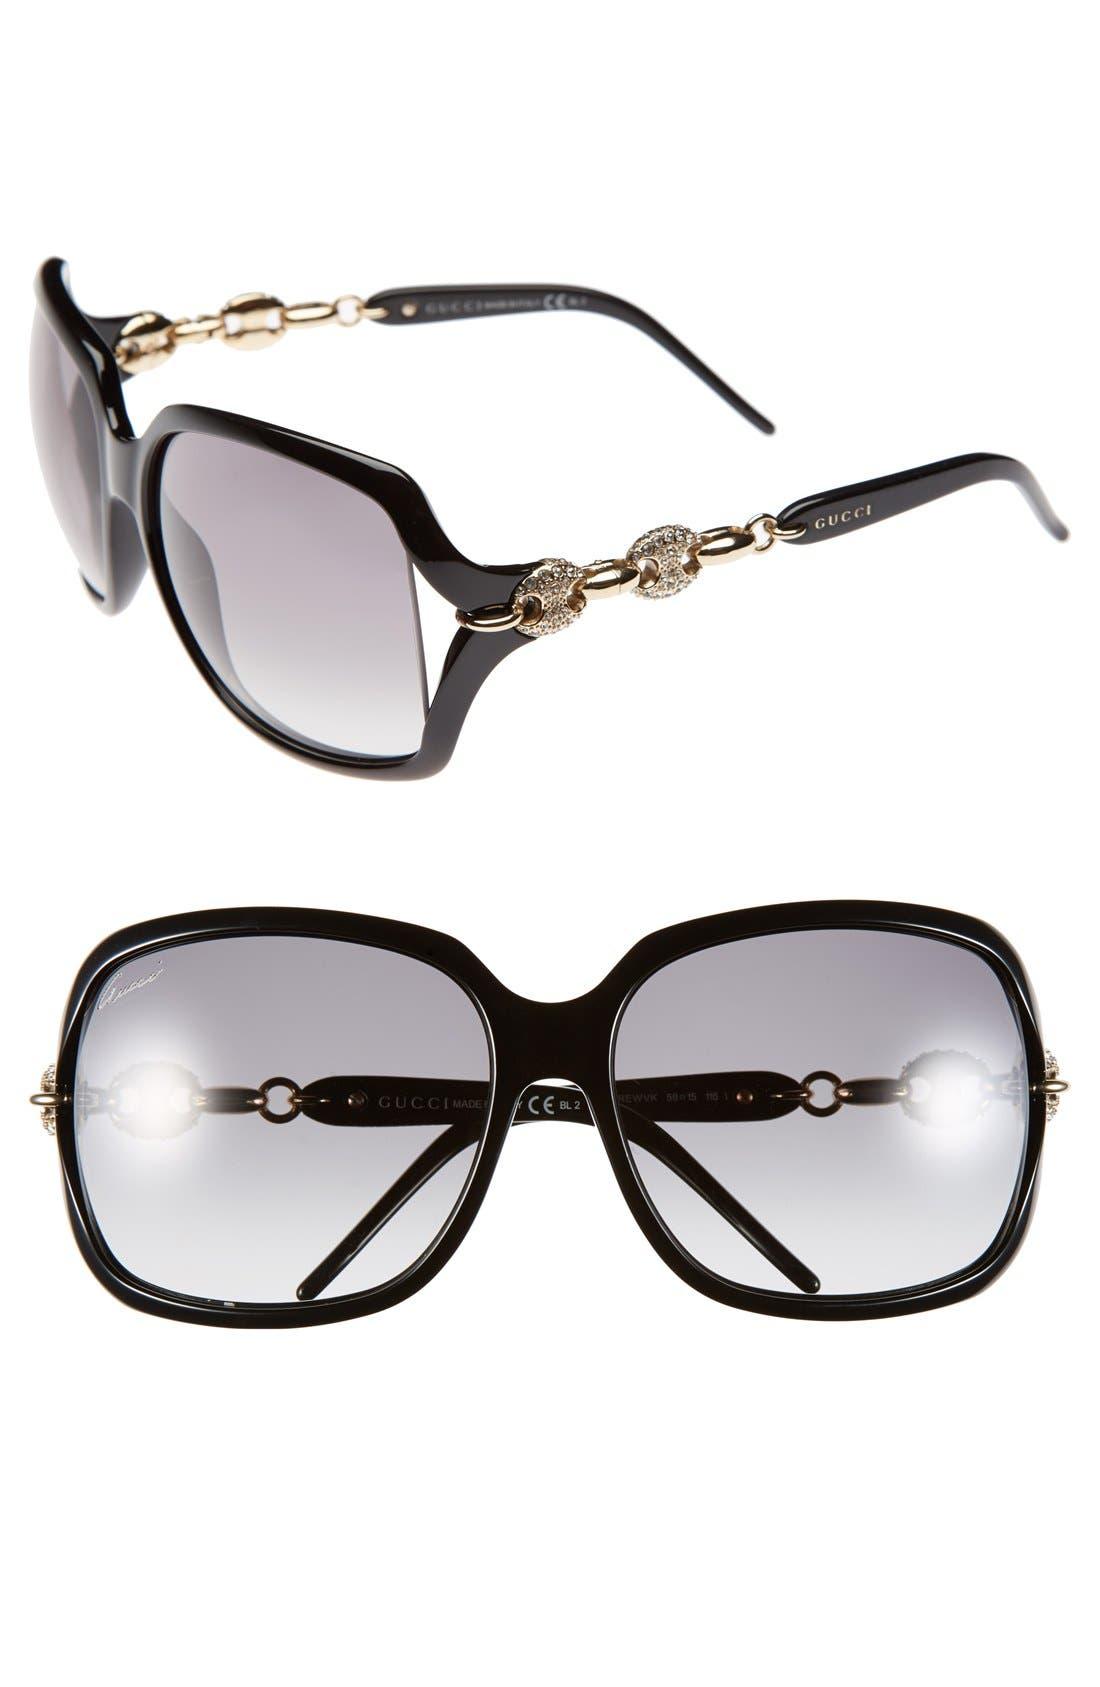 Alternate Image 1 Selected - Gucci 'Marina Chain' 59mm Swarovski Crystal Sunglasses